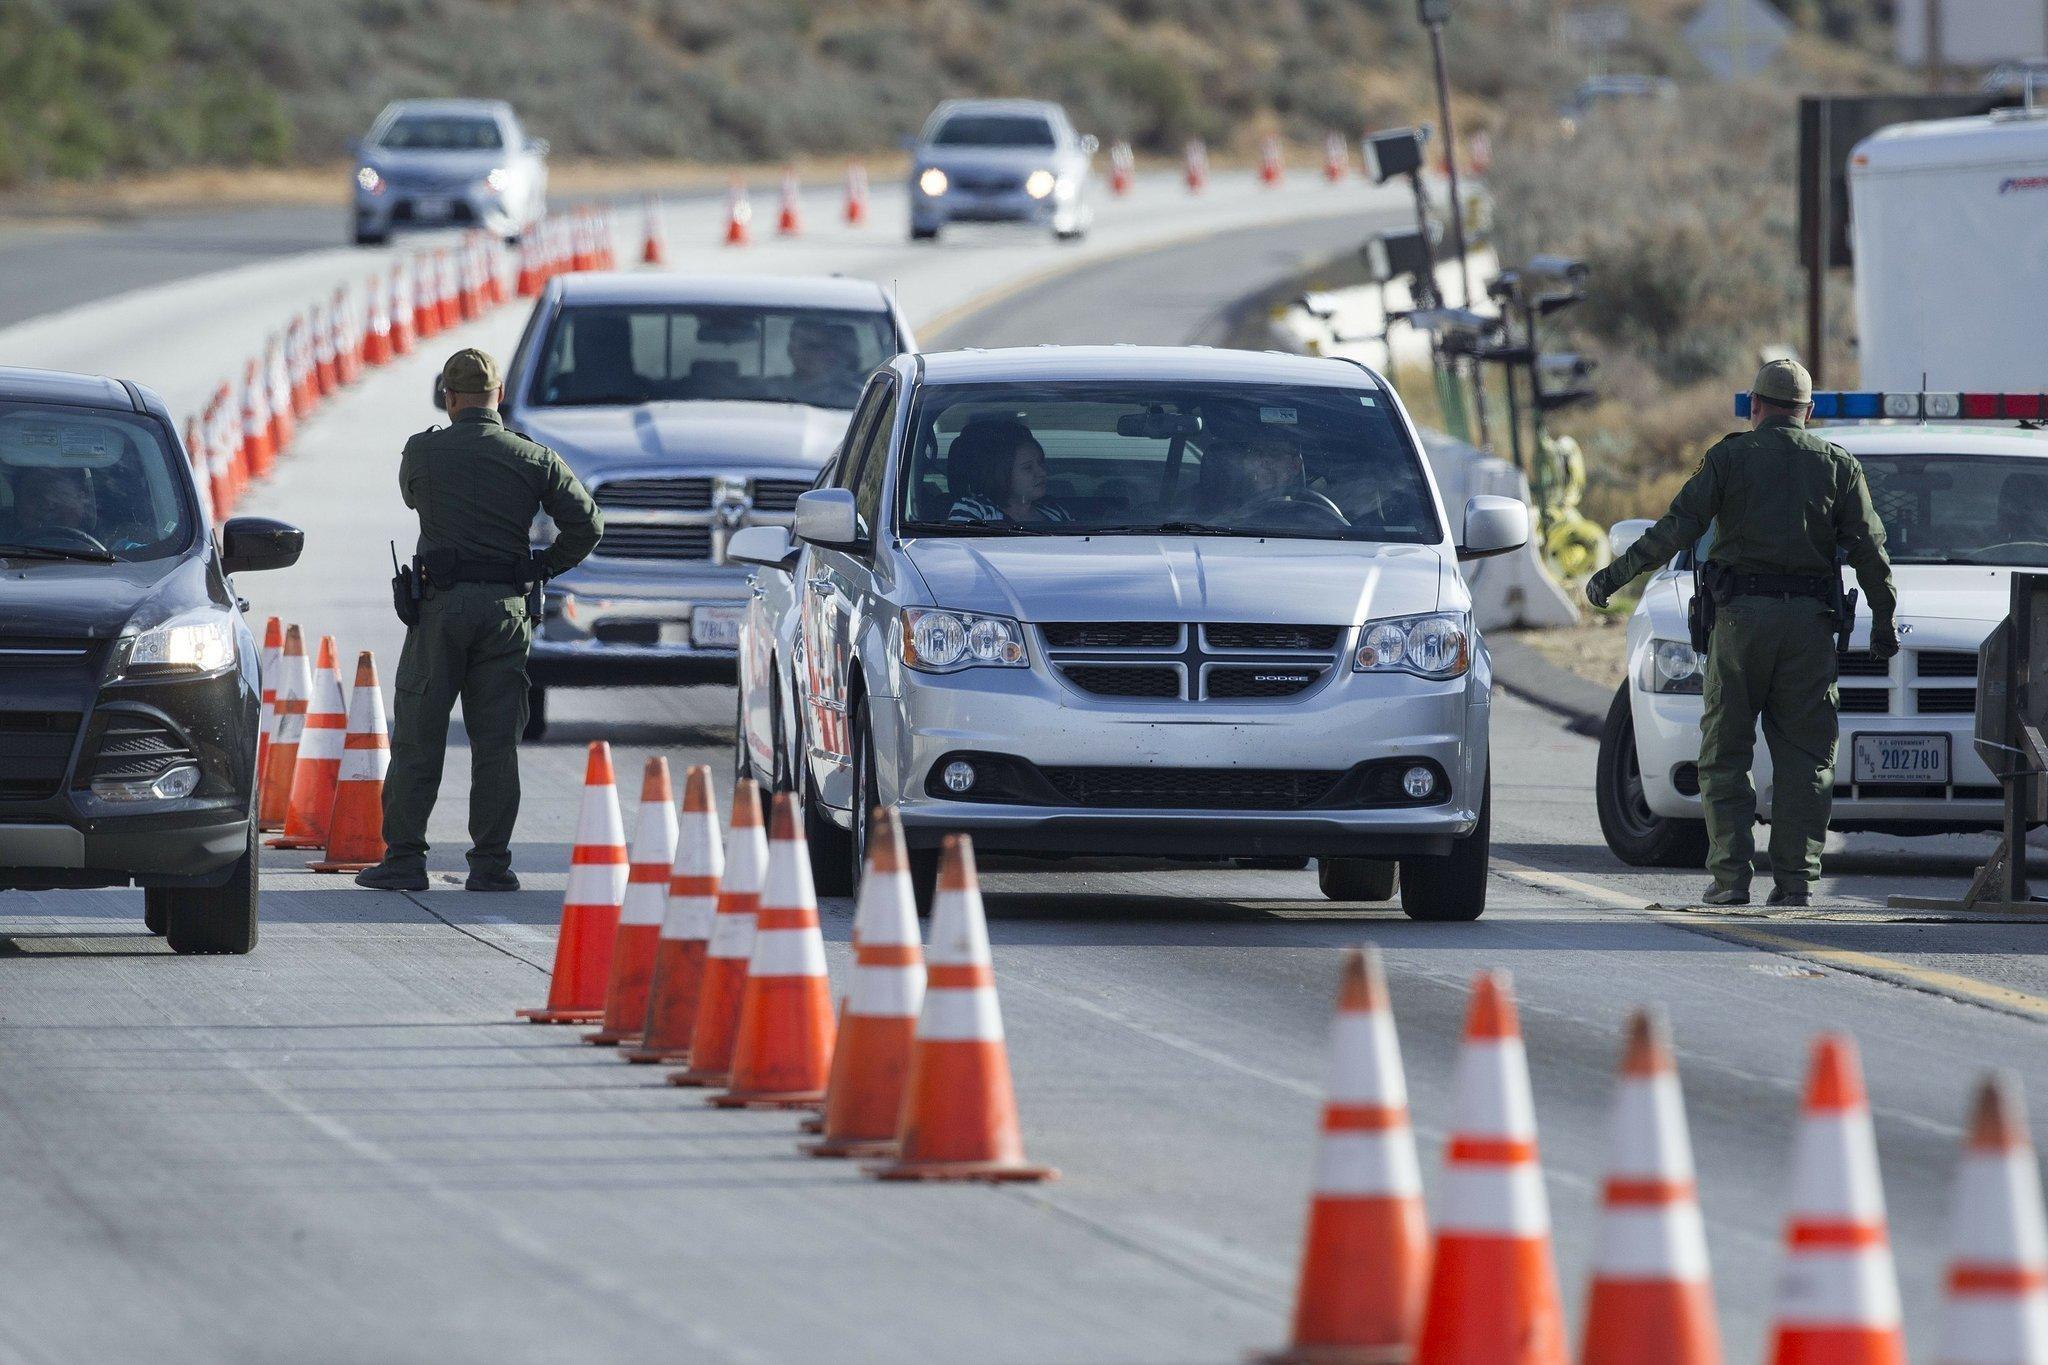 Checkpoints Push Buttons Boundaries Border Patrol